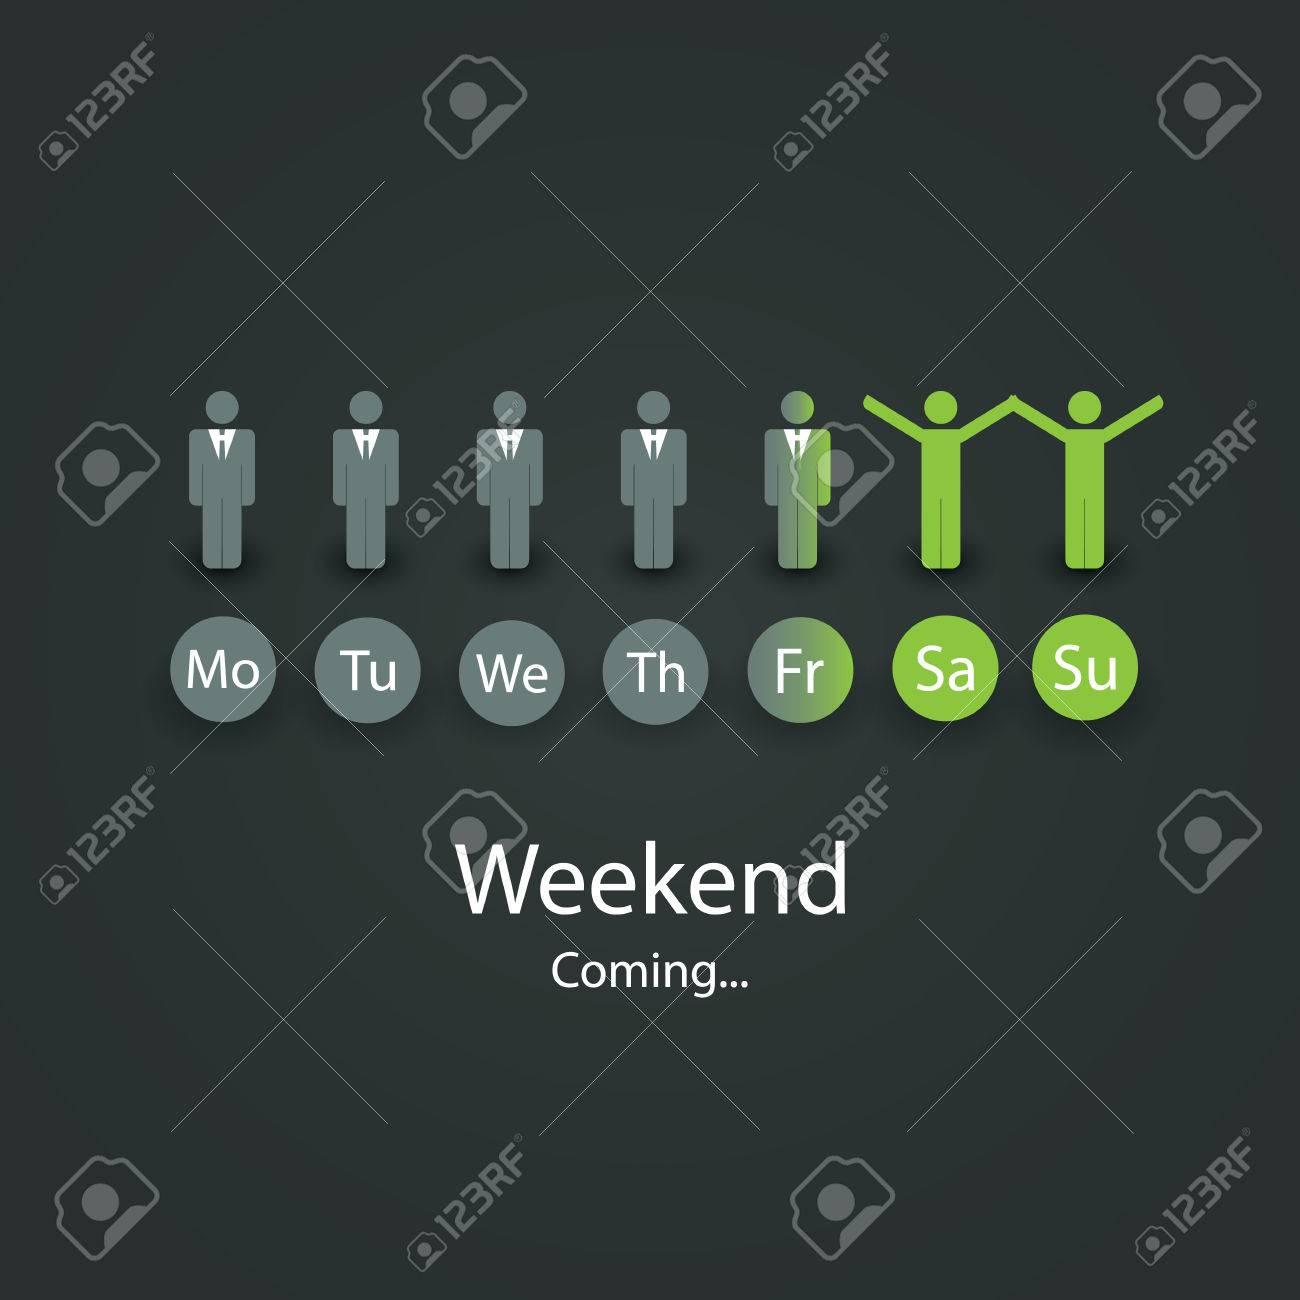 Weekends Coming Soon Illustration - 24247146